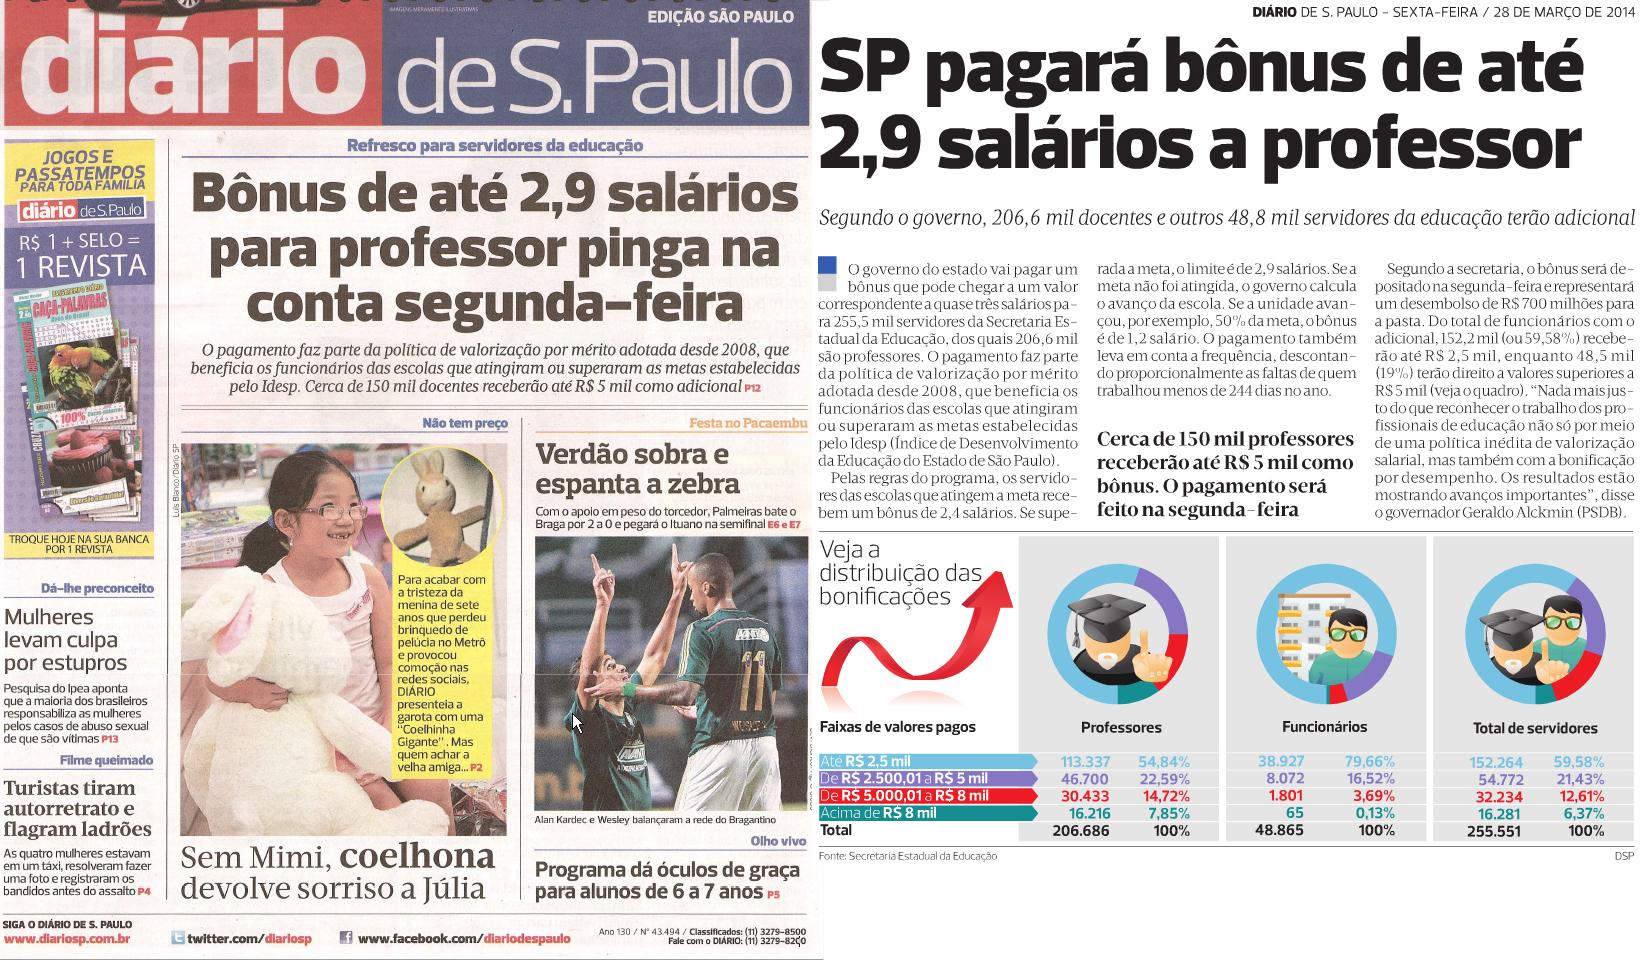 Capa_e_materia_Diario_SP